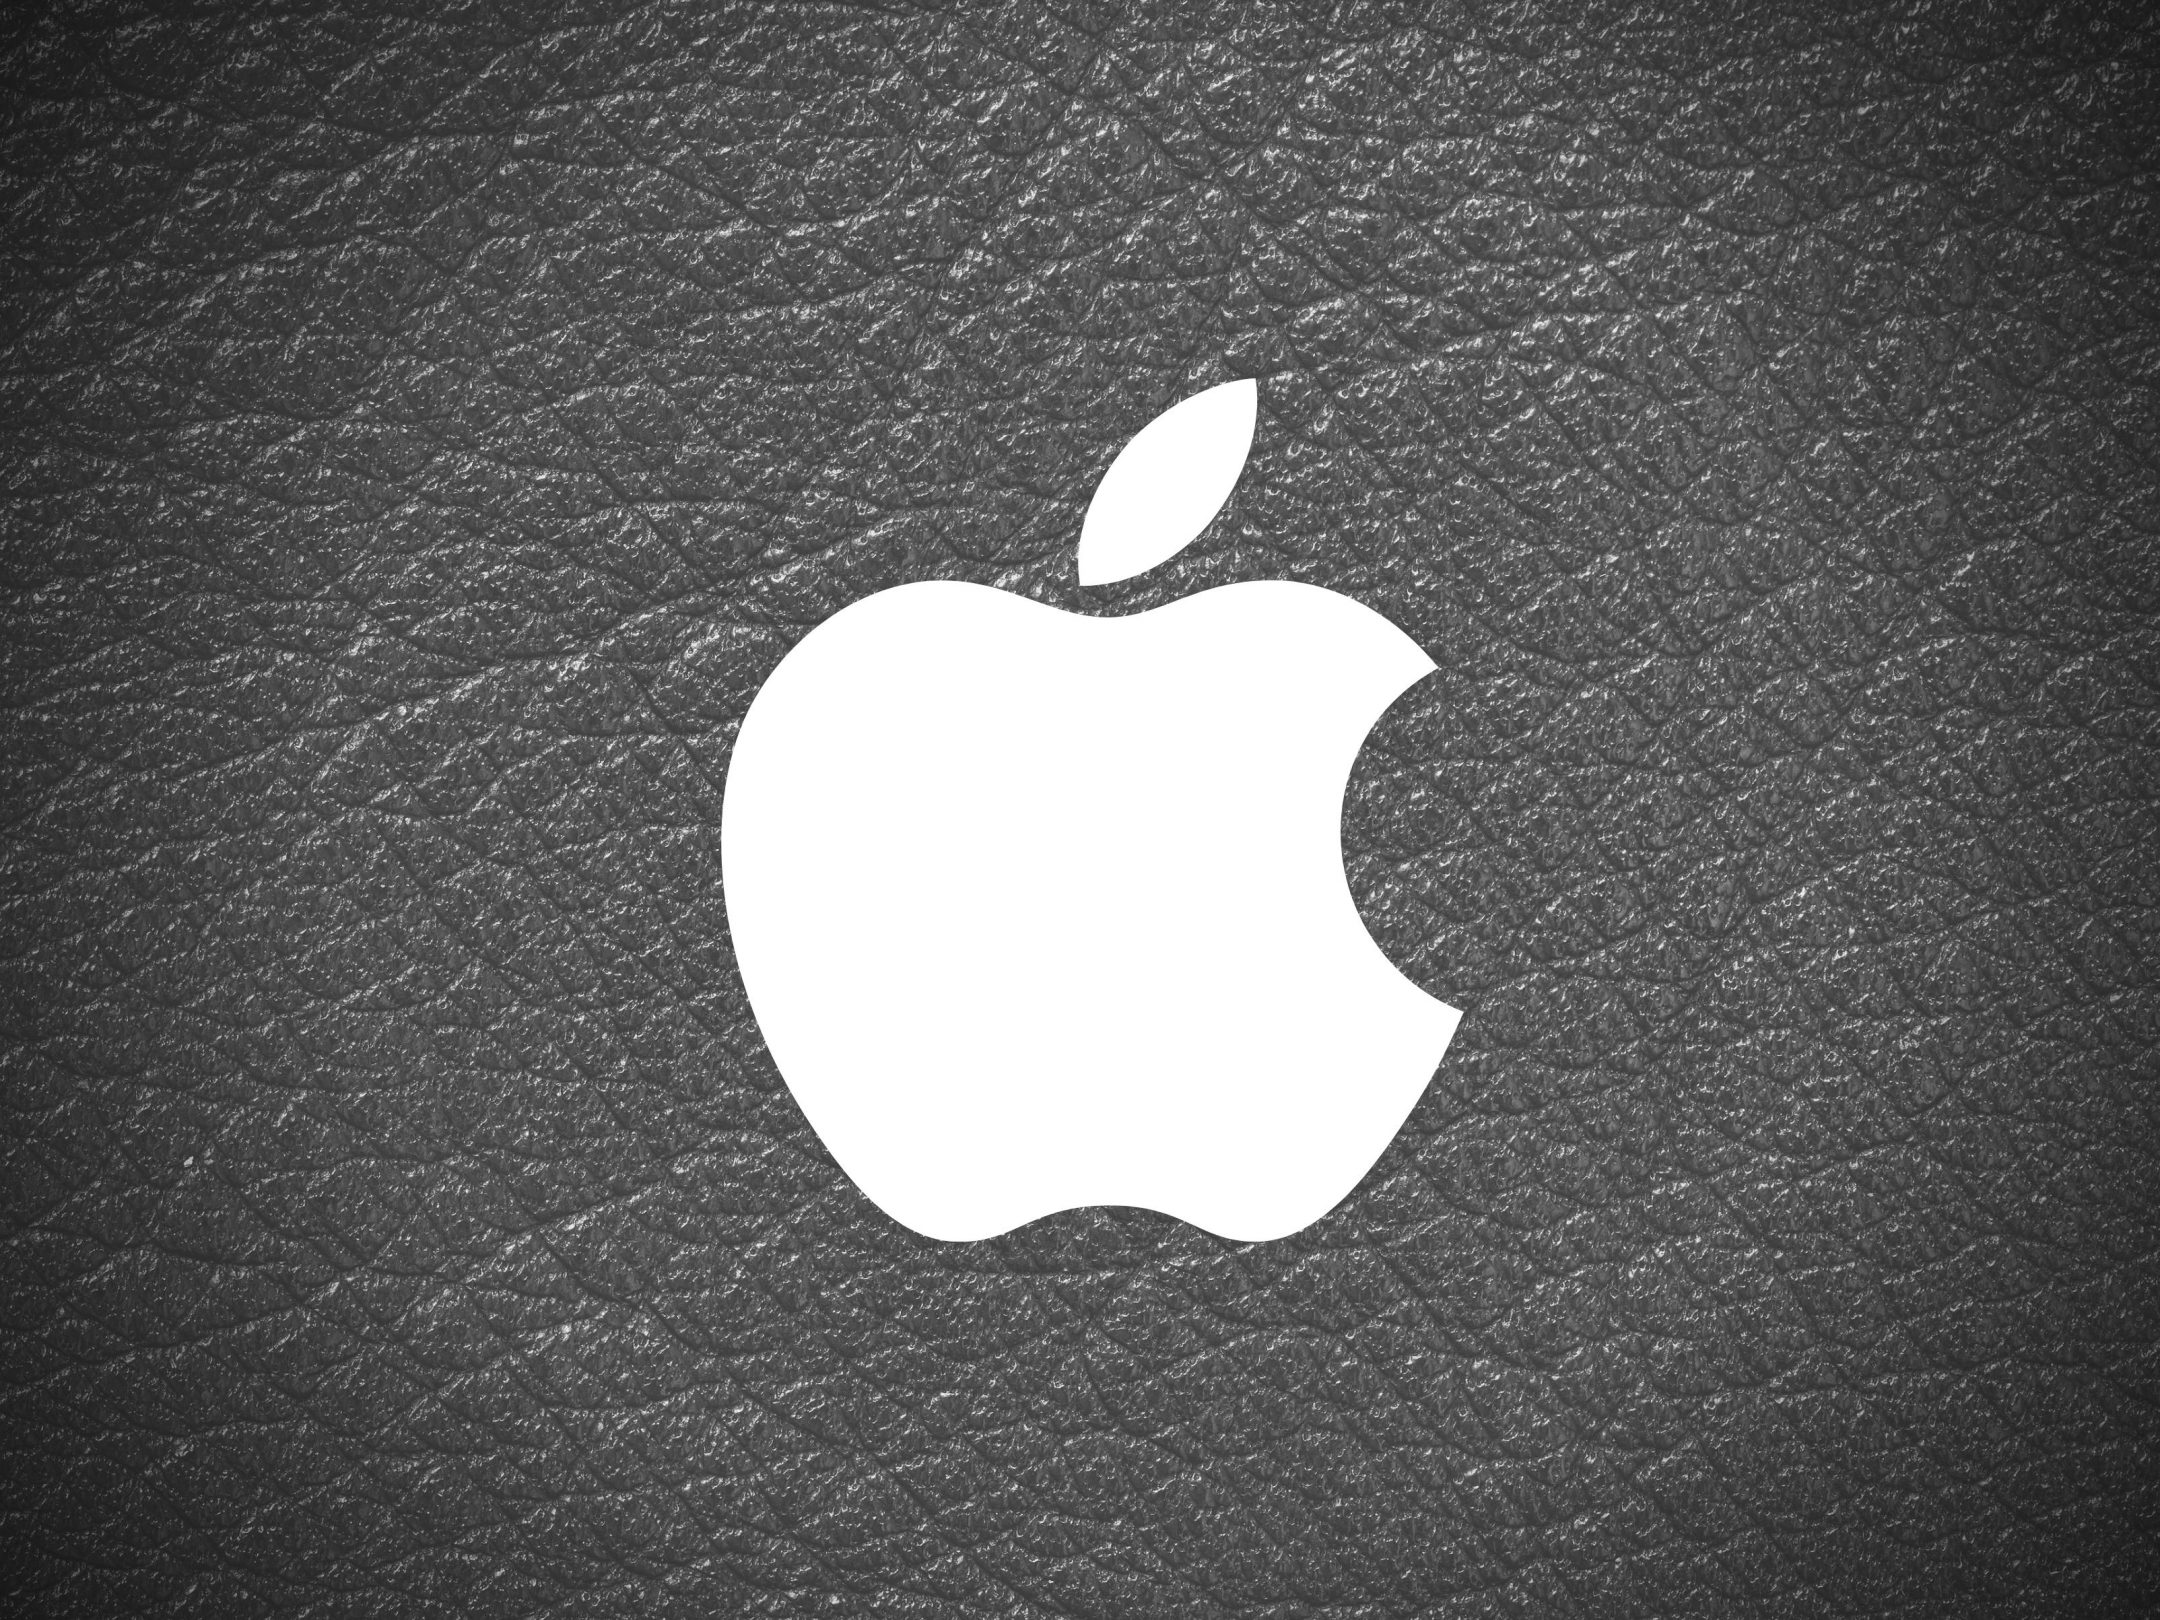 2160x1620 iPad wallpaper 4k Apple Logo Leather Black and White iPad Wallpaper 2160x1620 pixels resolution